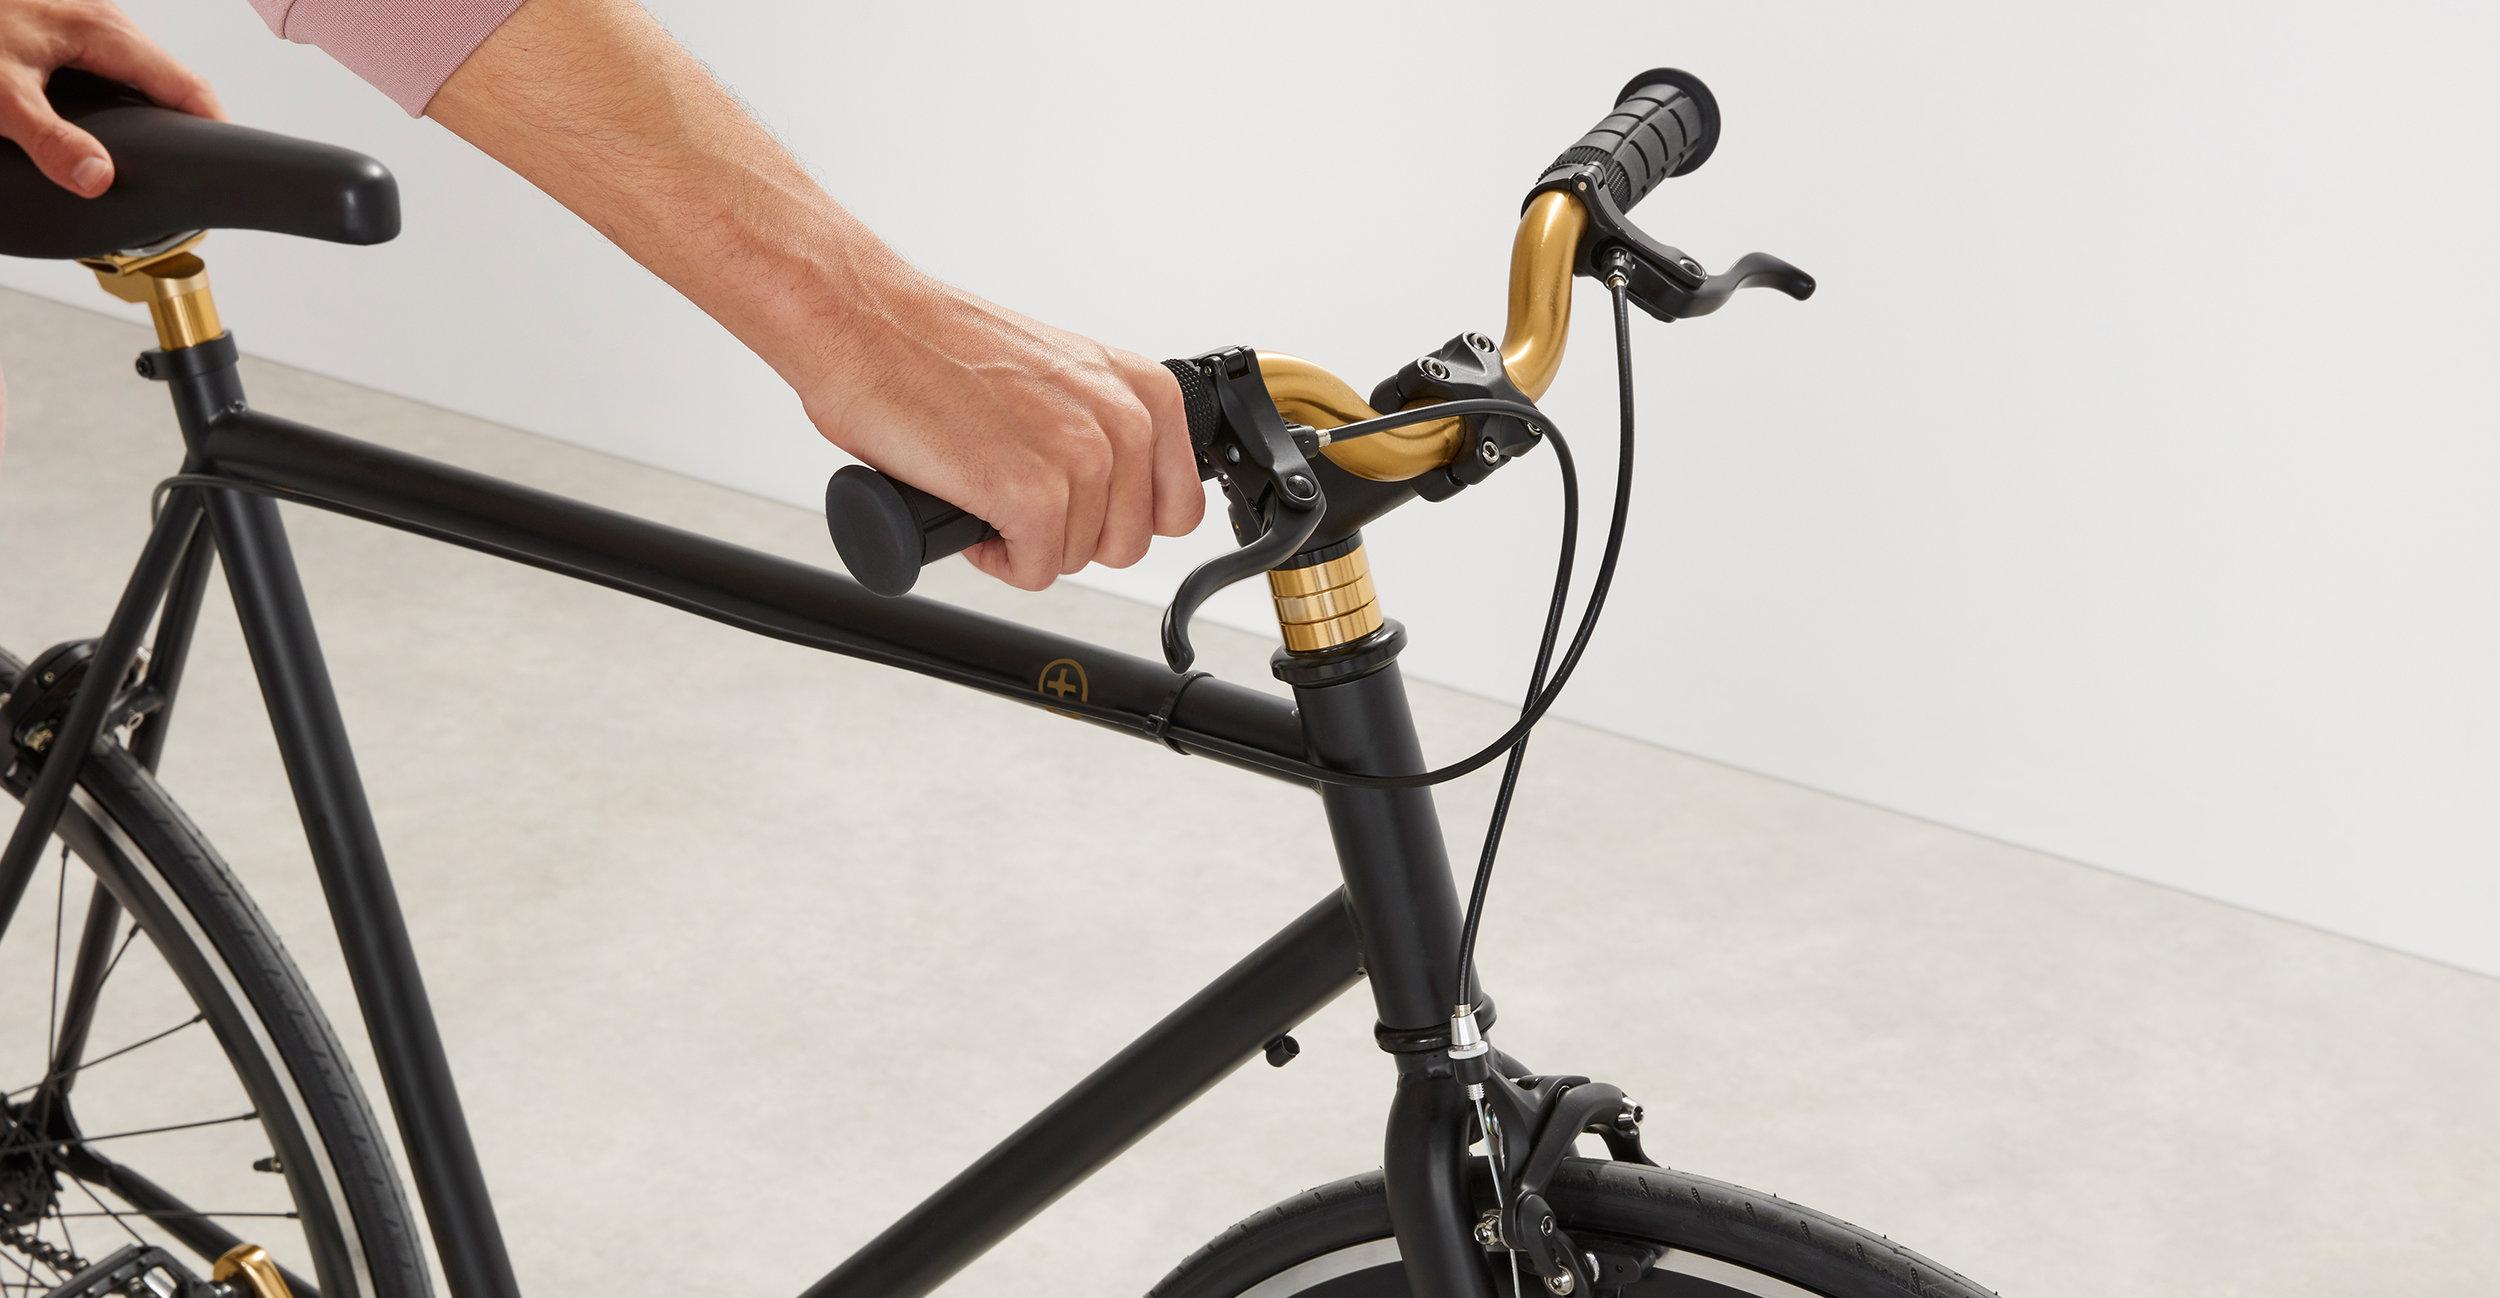 BIKCWN002BLA-UK_Colwyn_Single_Speed_City_Bike_Matt_Black_Gold_SM_LB03.jpg